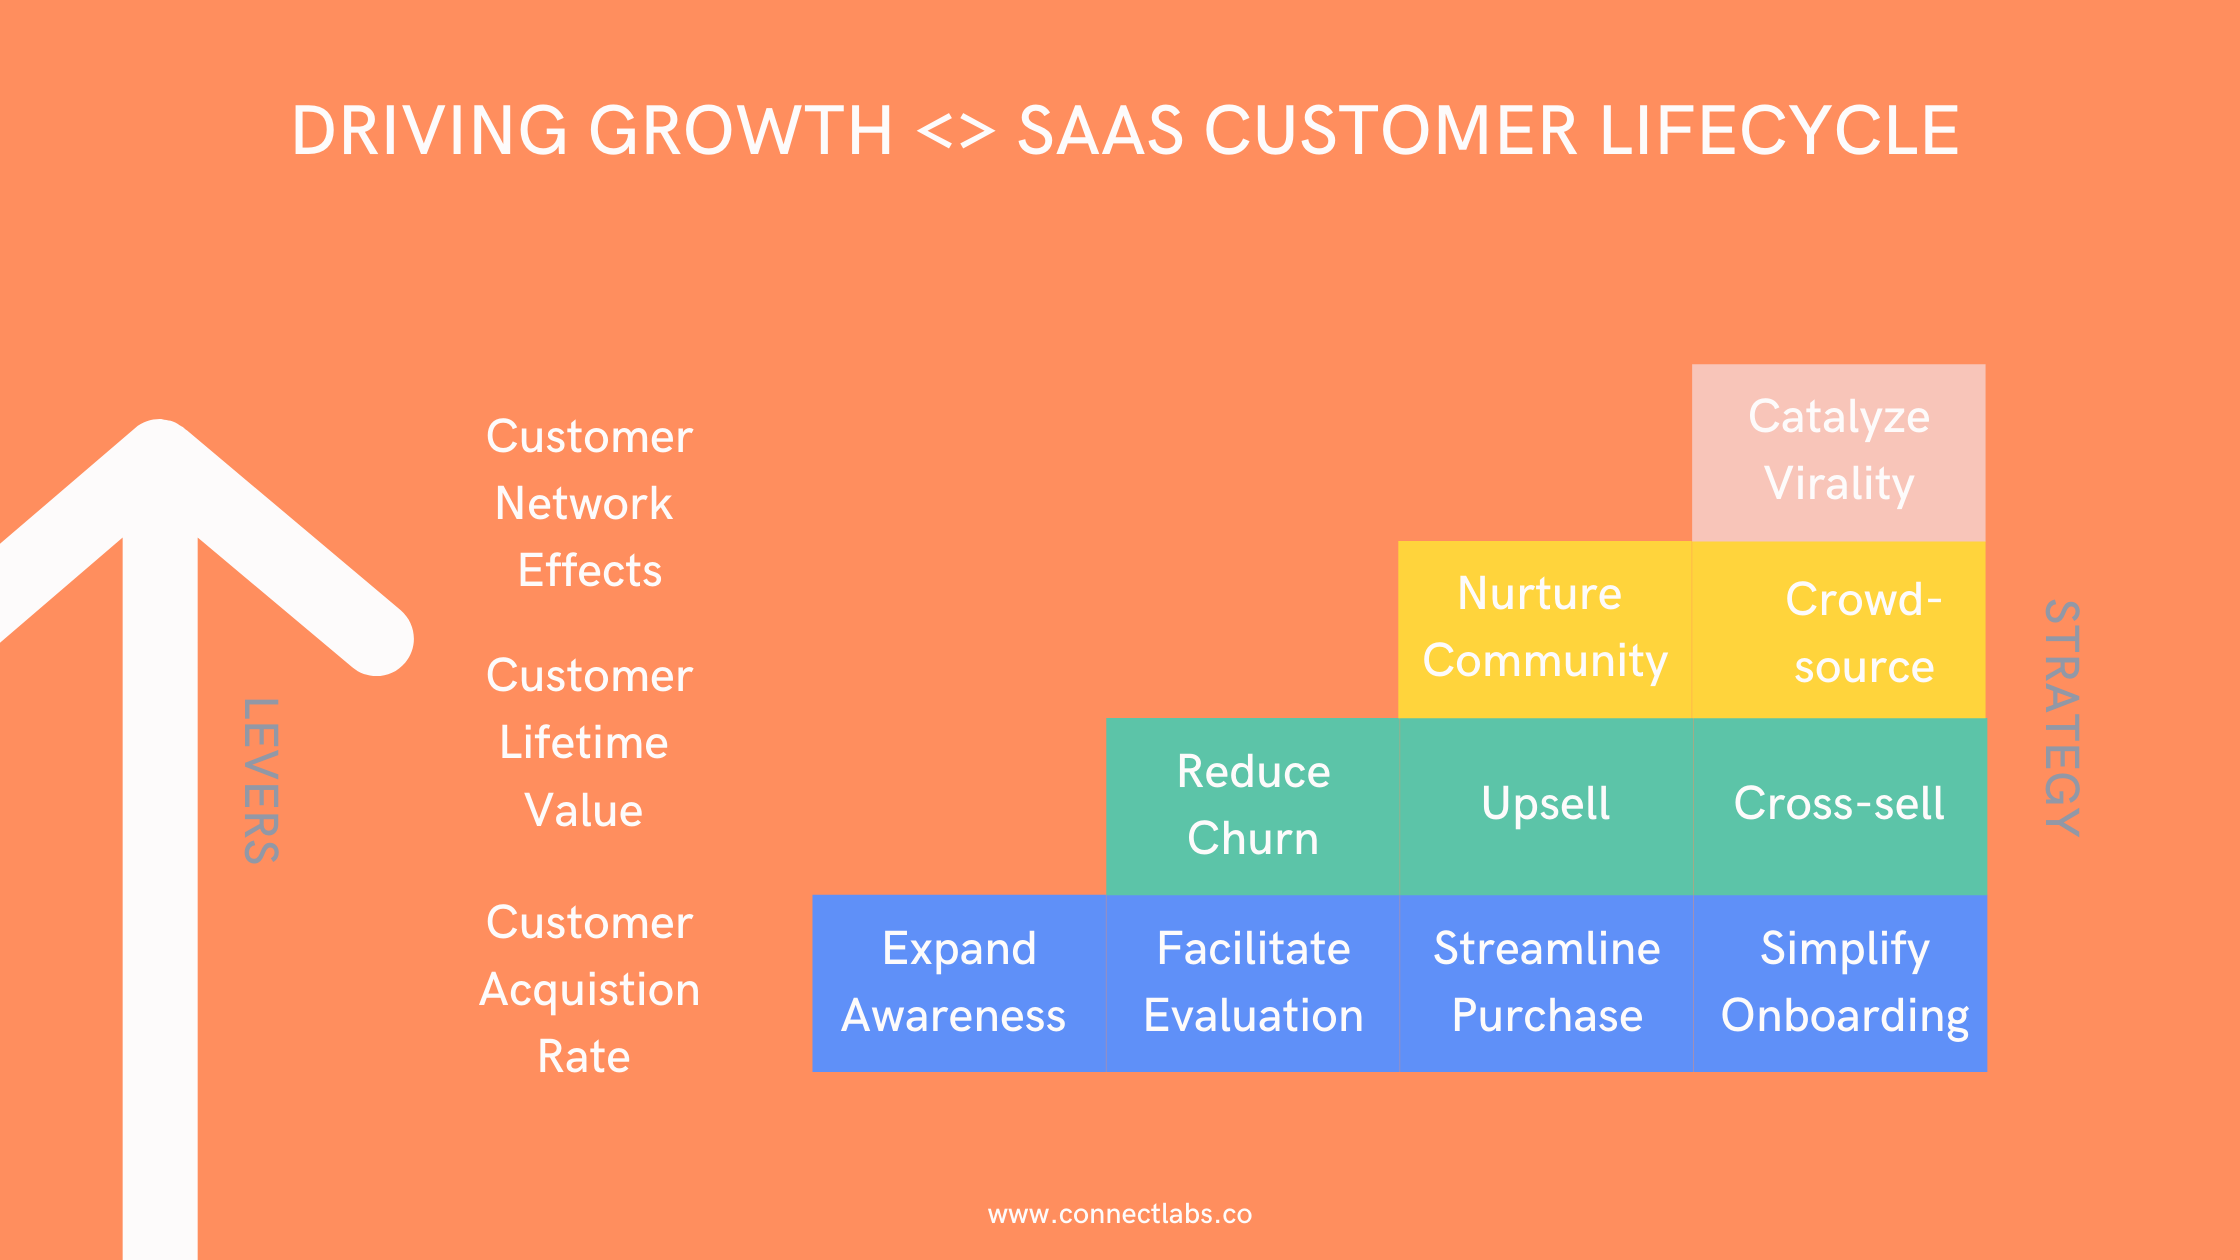 Driving SaaS Growth